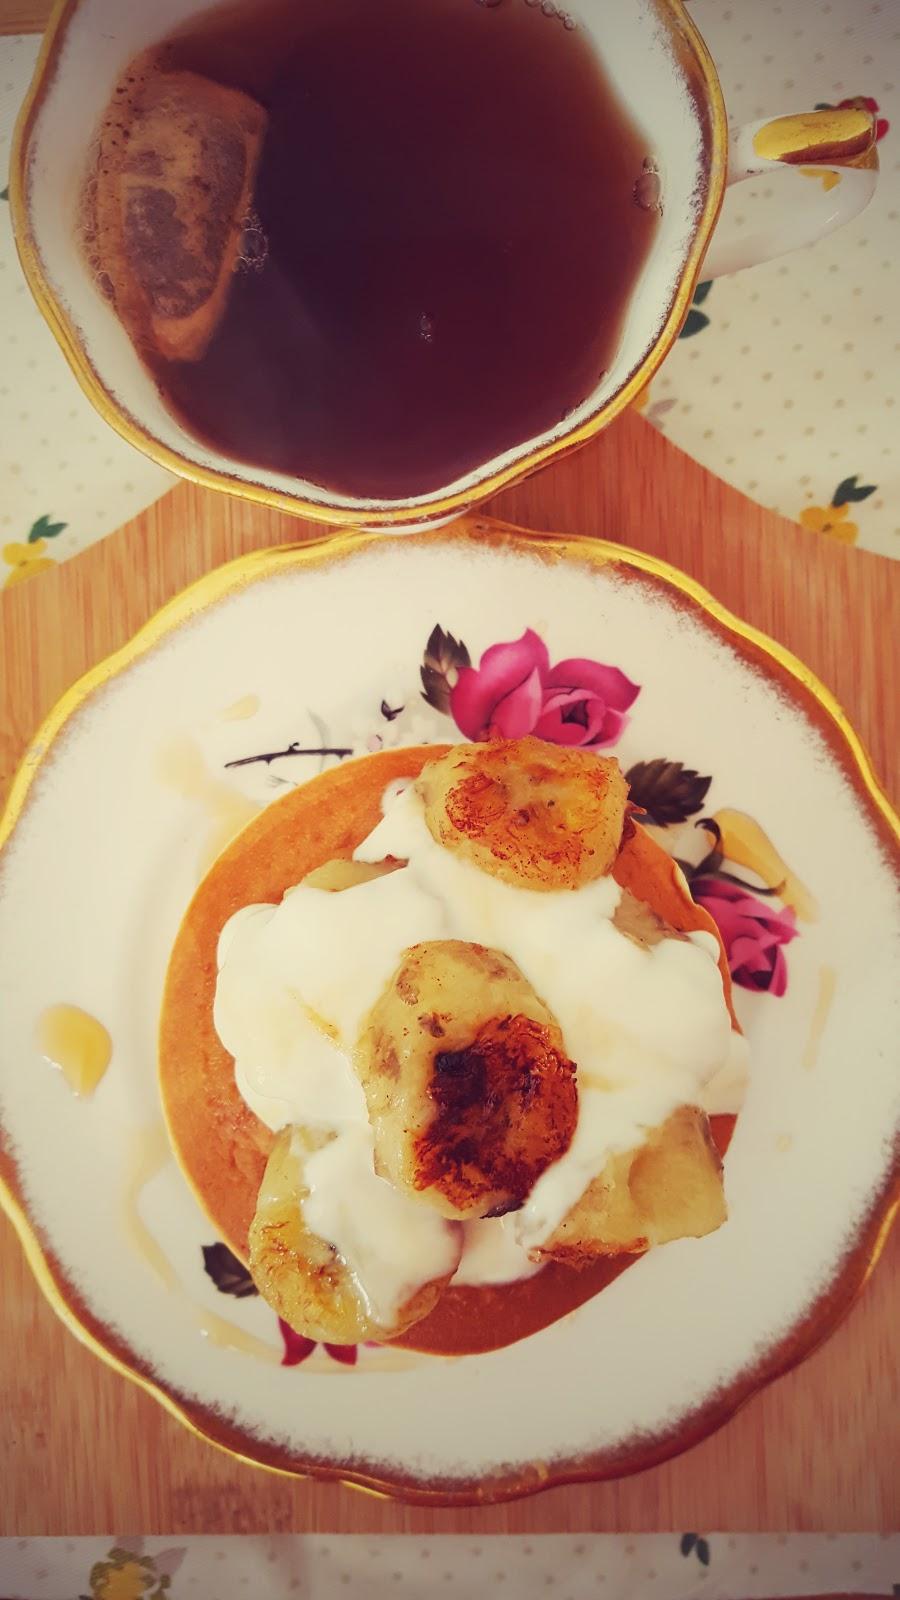 Fried Banana, Maple Syrup Pancakes